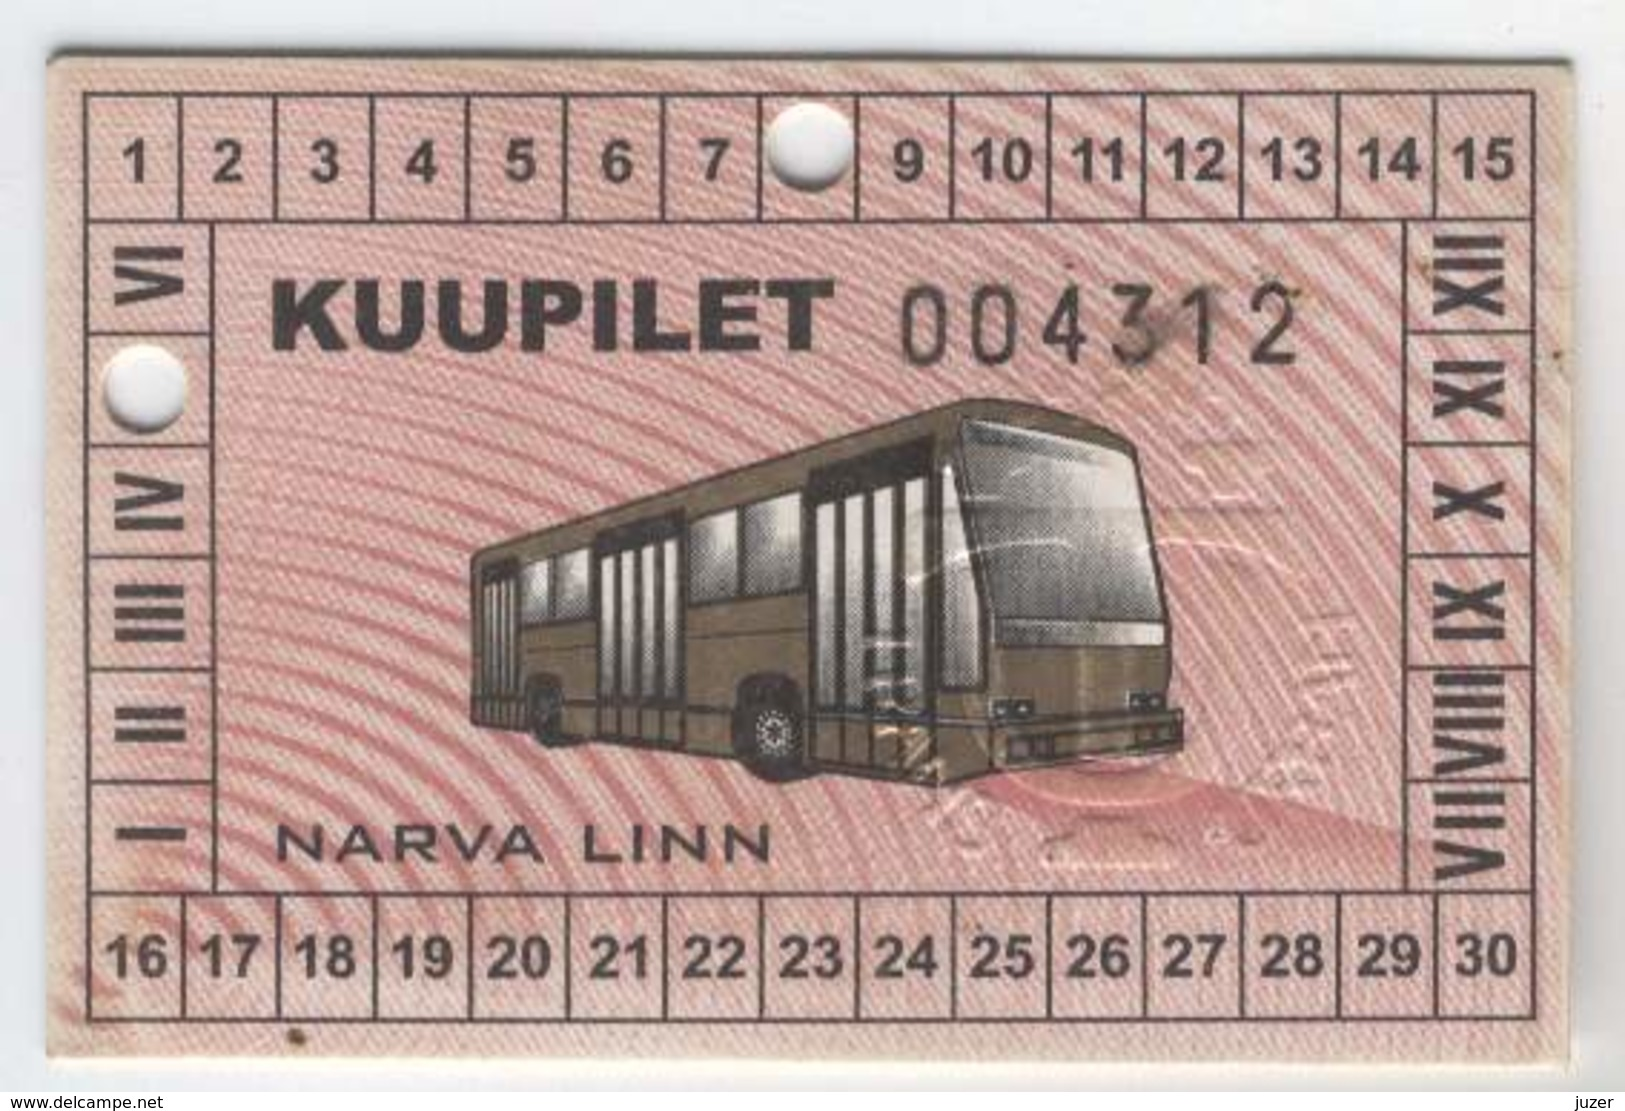 Estonia: Month Bus Ticket From Narva (6) - Europe